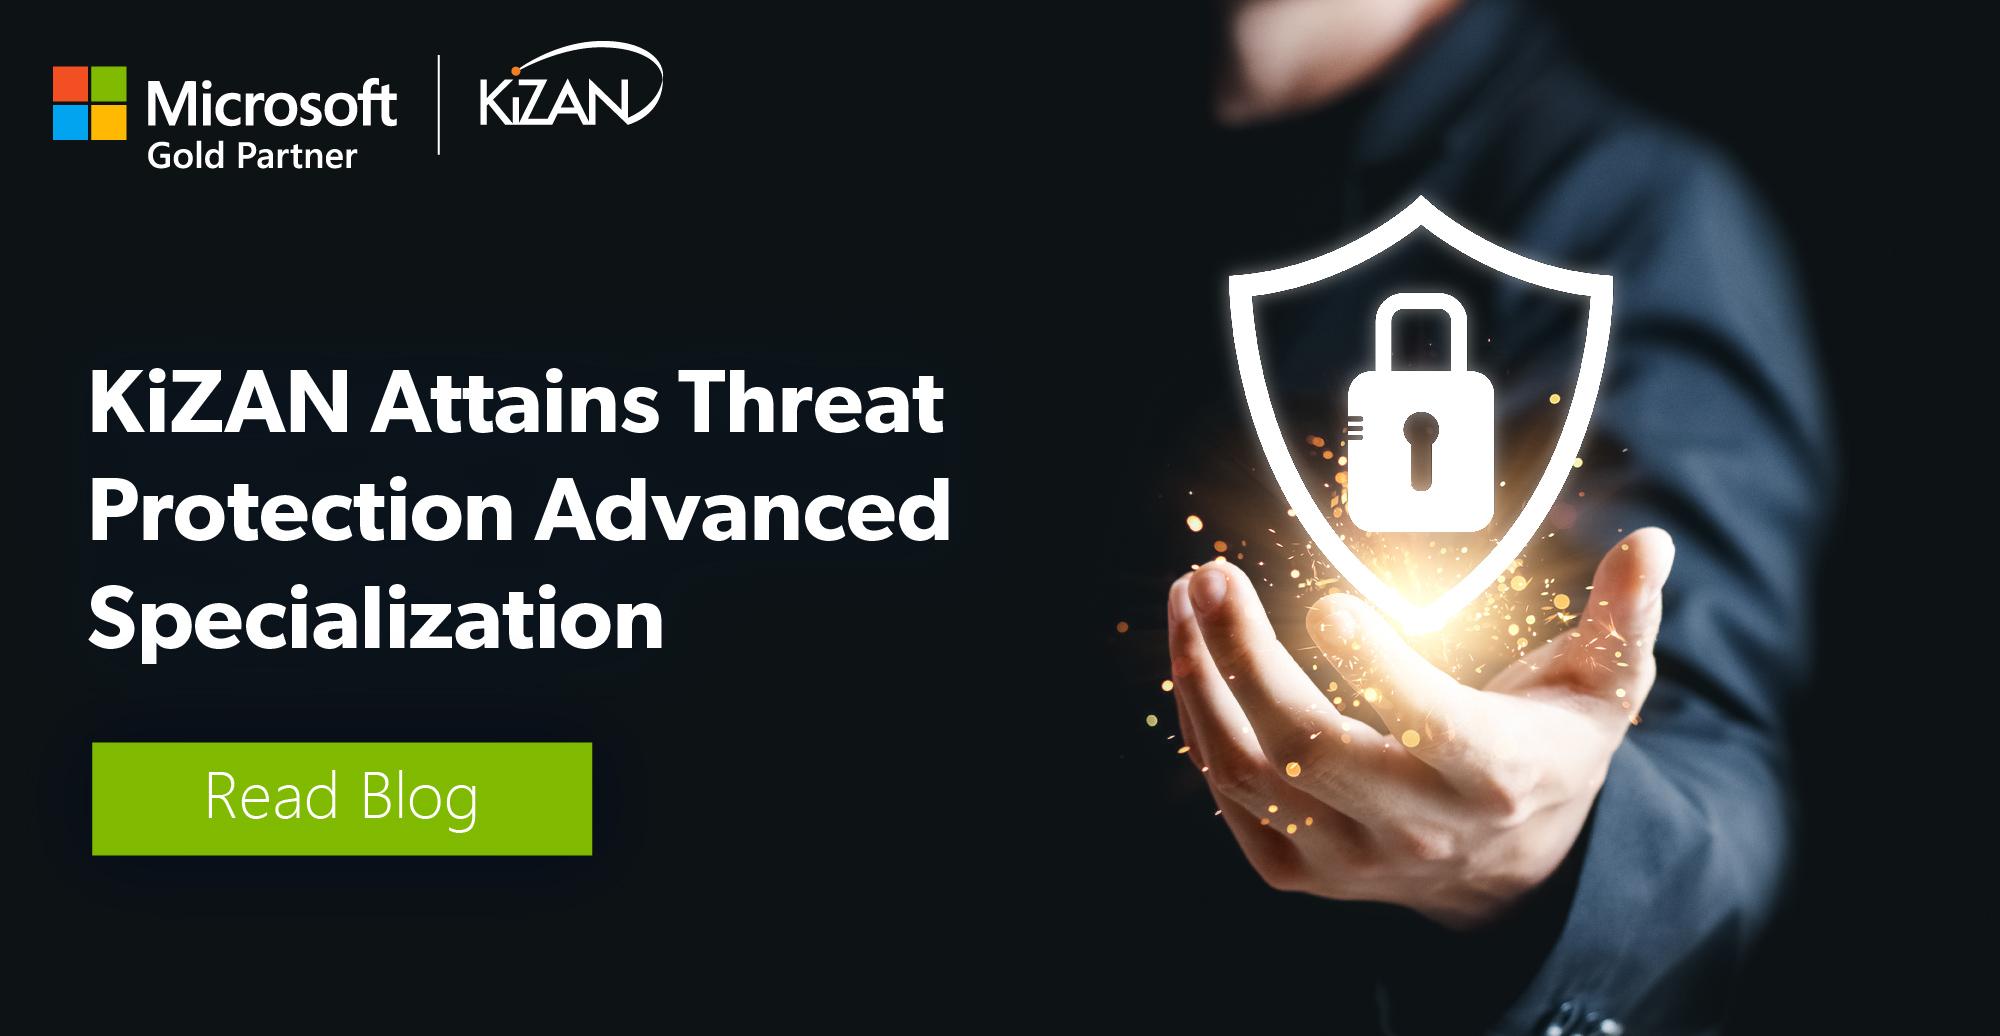 KiZAN Attains Threat Protection Advanced Specialization